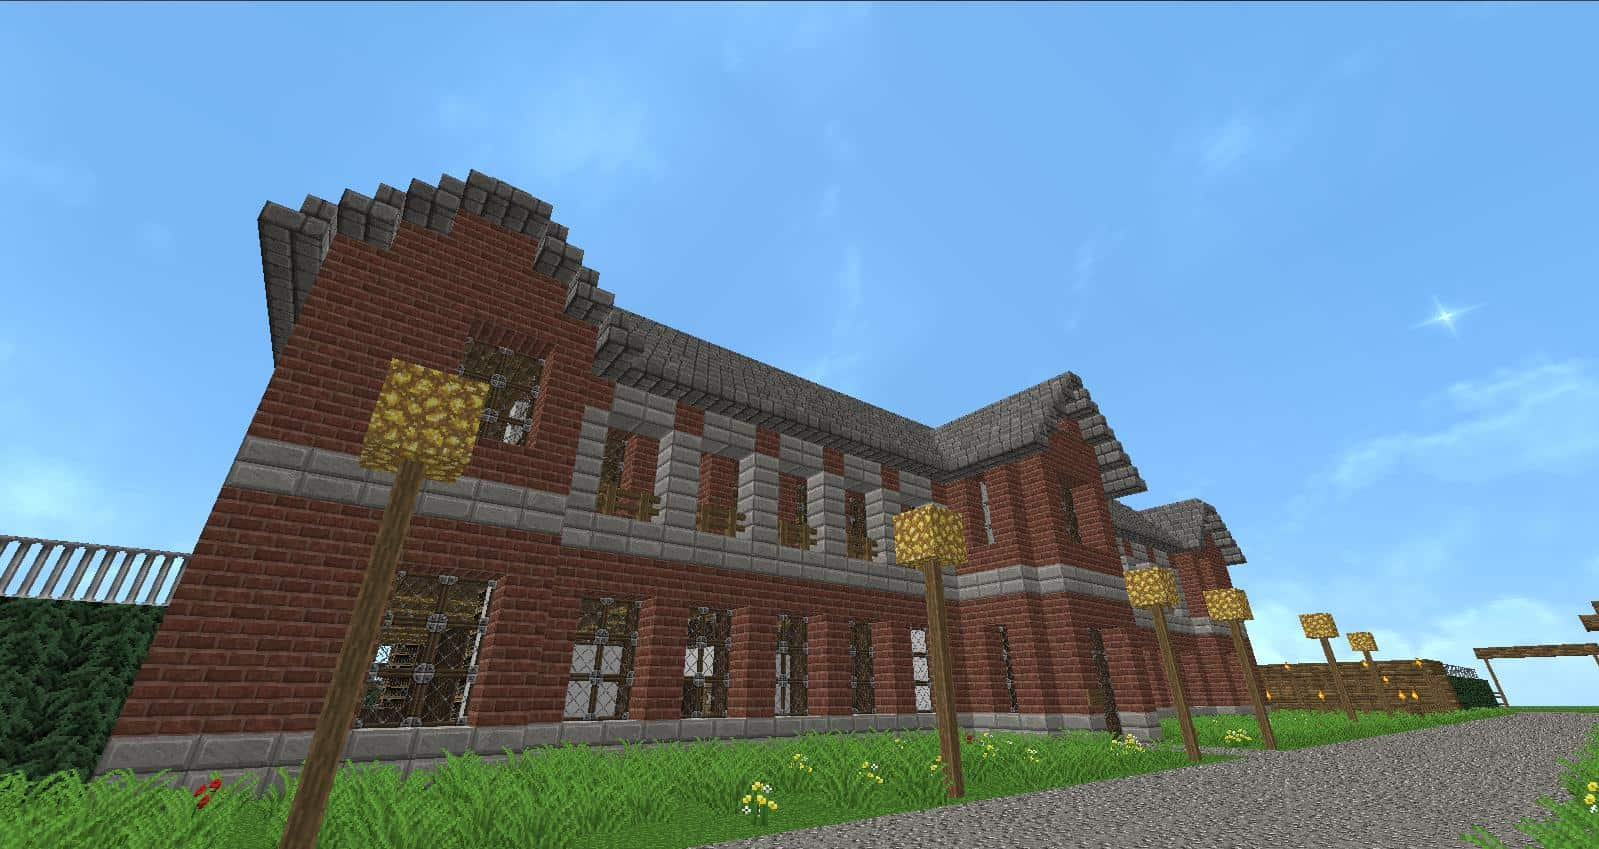 Image Result For Farm Minecraft Barn